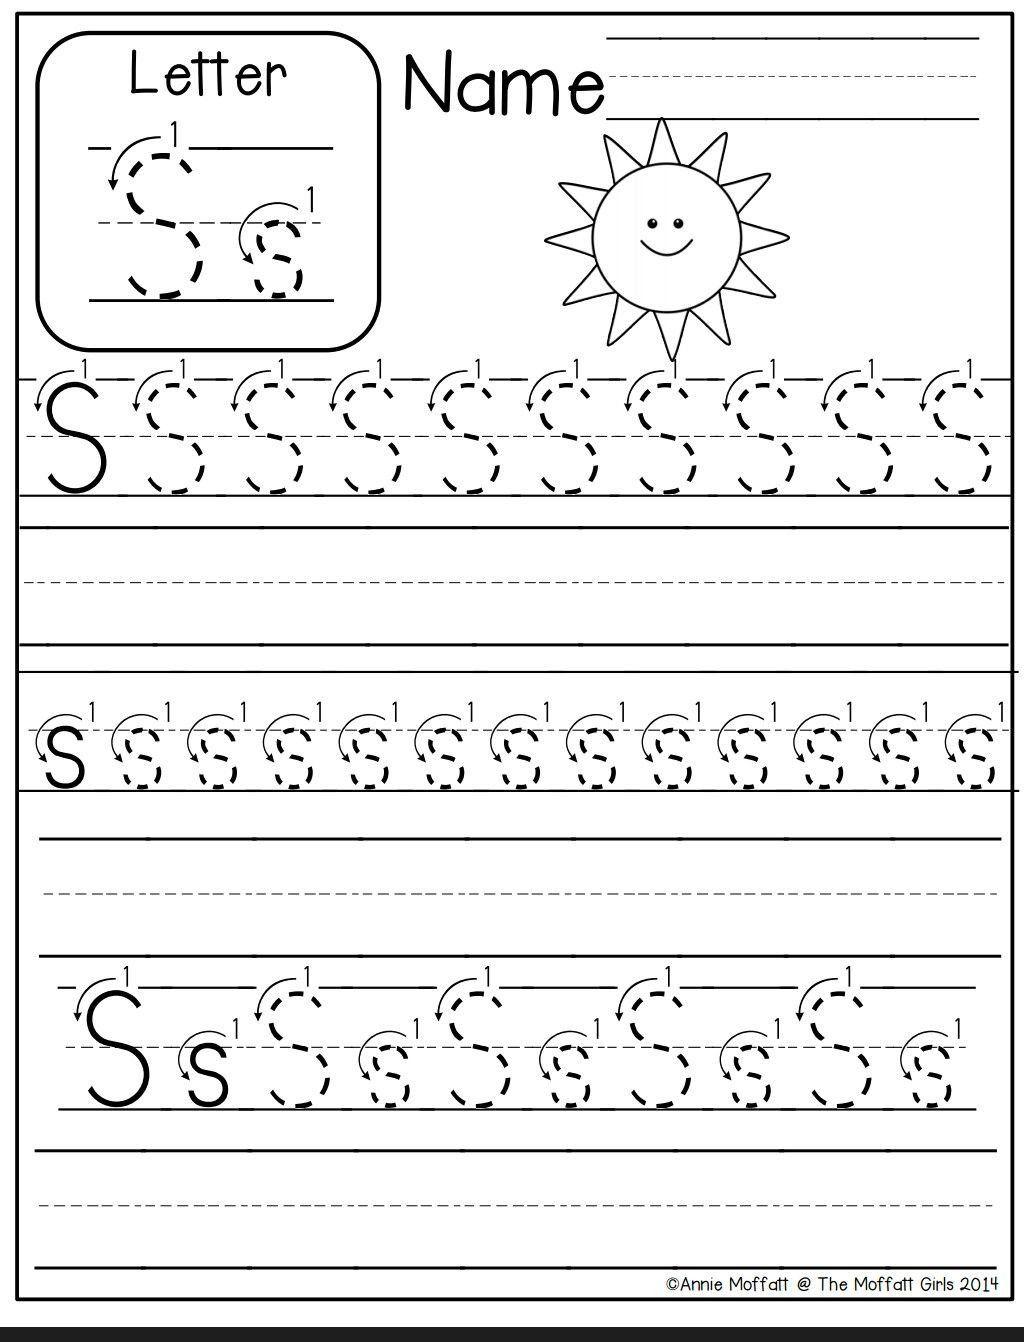 Writing Worksheets For Preschoolers Math Worksheet